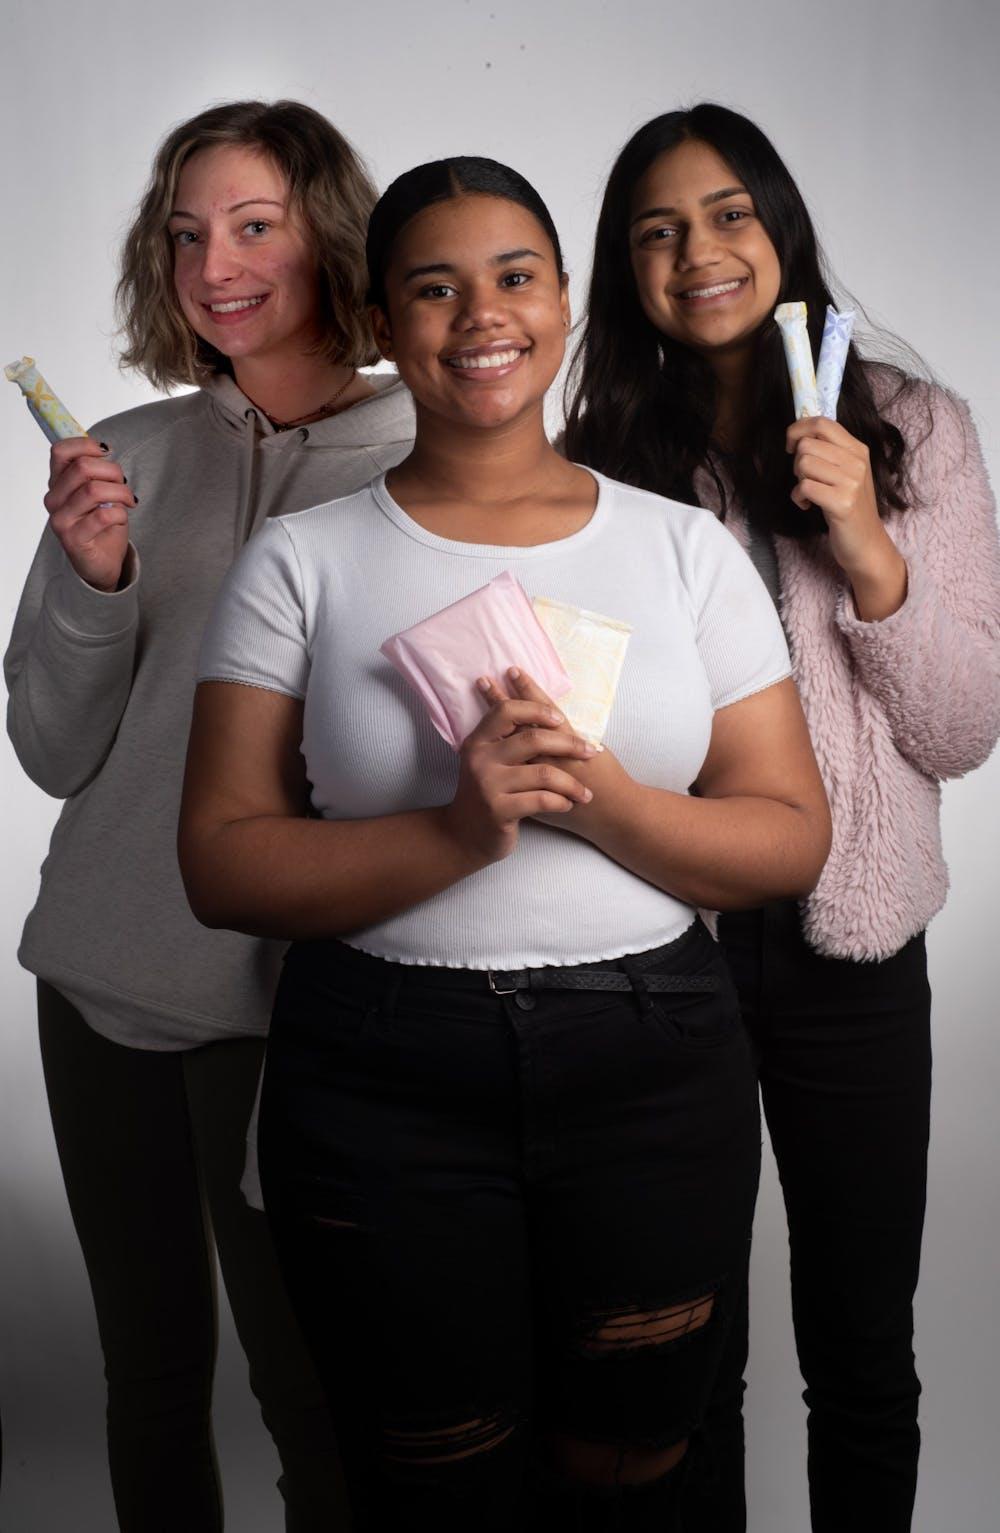 <p>Emily Estrada, left, and Ta'Sheena Williams, center, and Nama Naseem, left, pose for a photo on Feb. 5, 2019.</p>